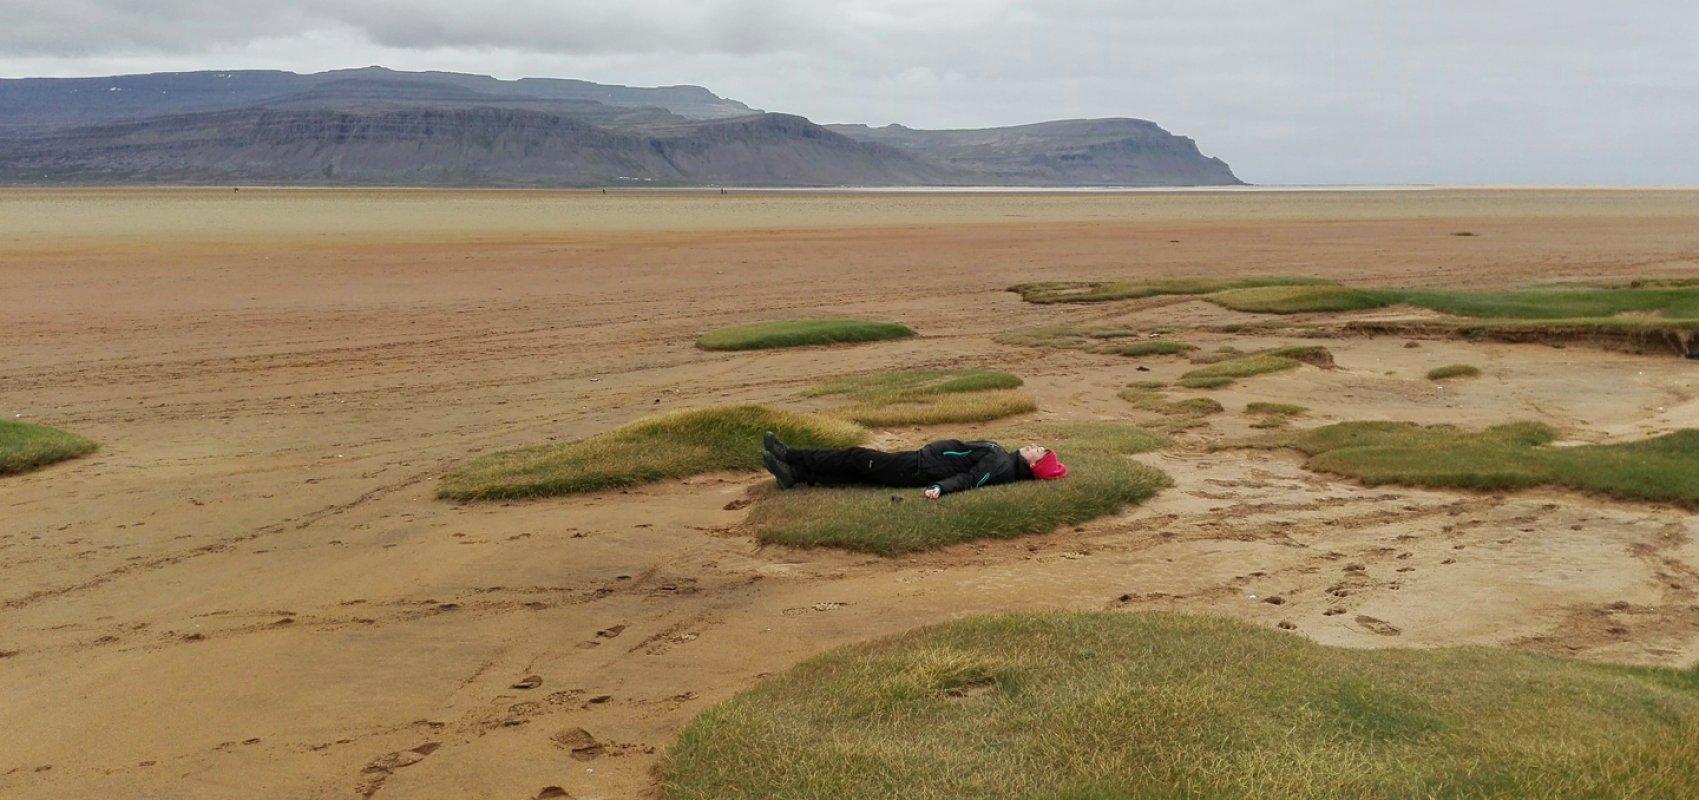 INSPIRATION: Iceland